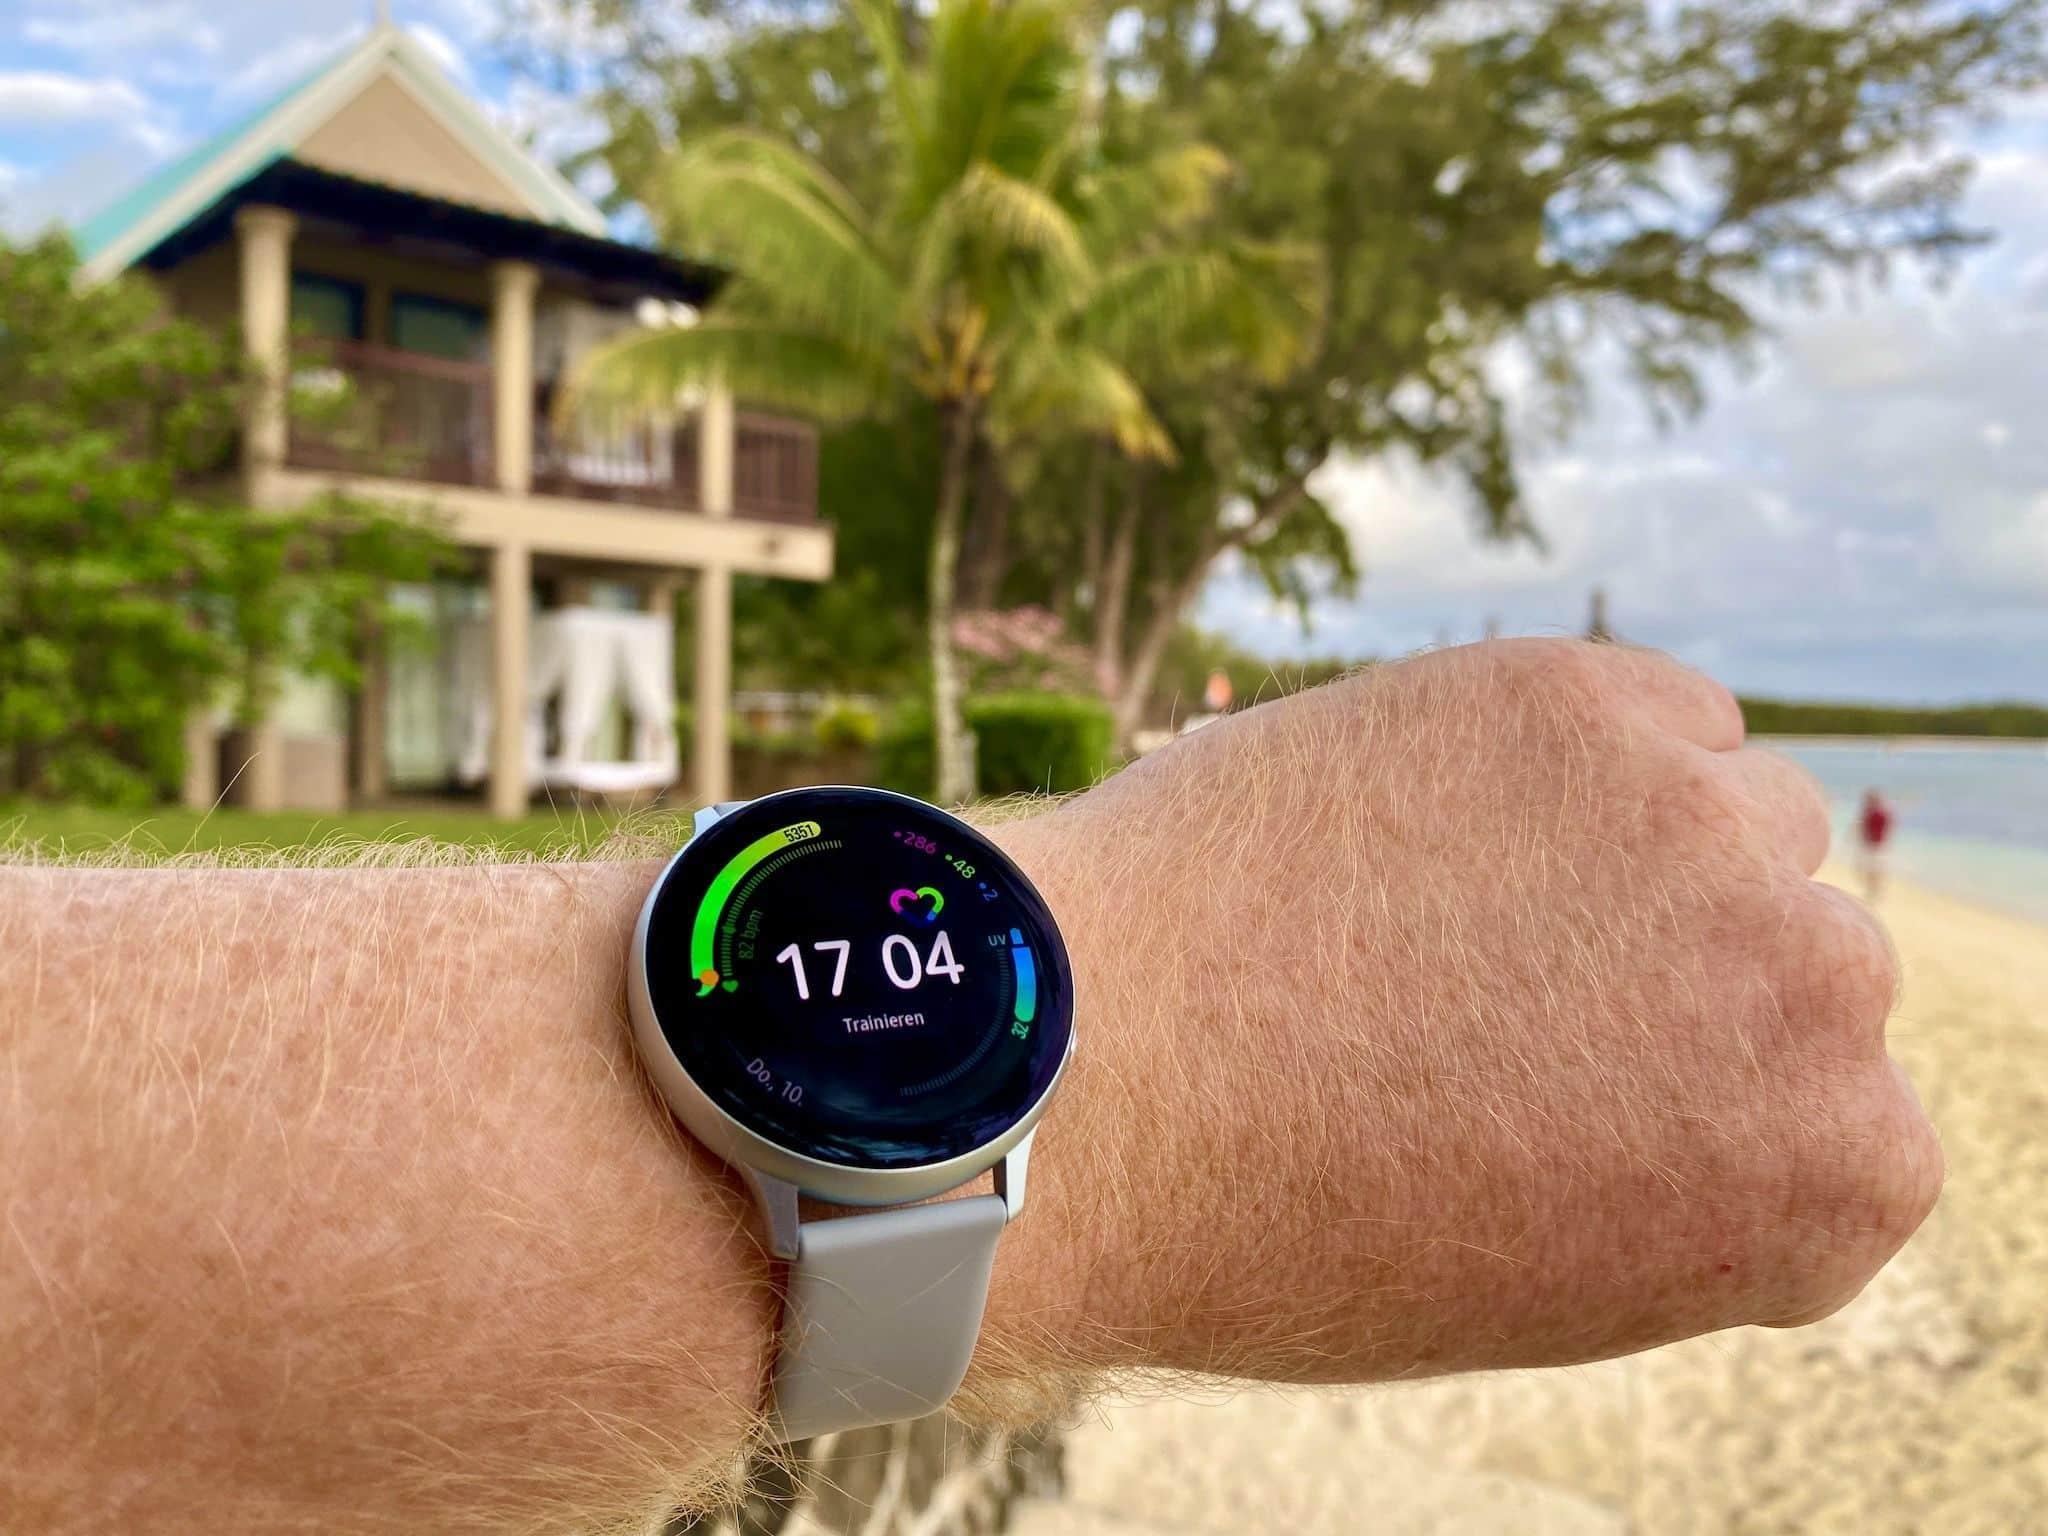 Samsung Galaxy Watch Active 2: Confira o review completo